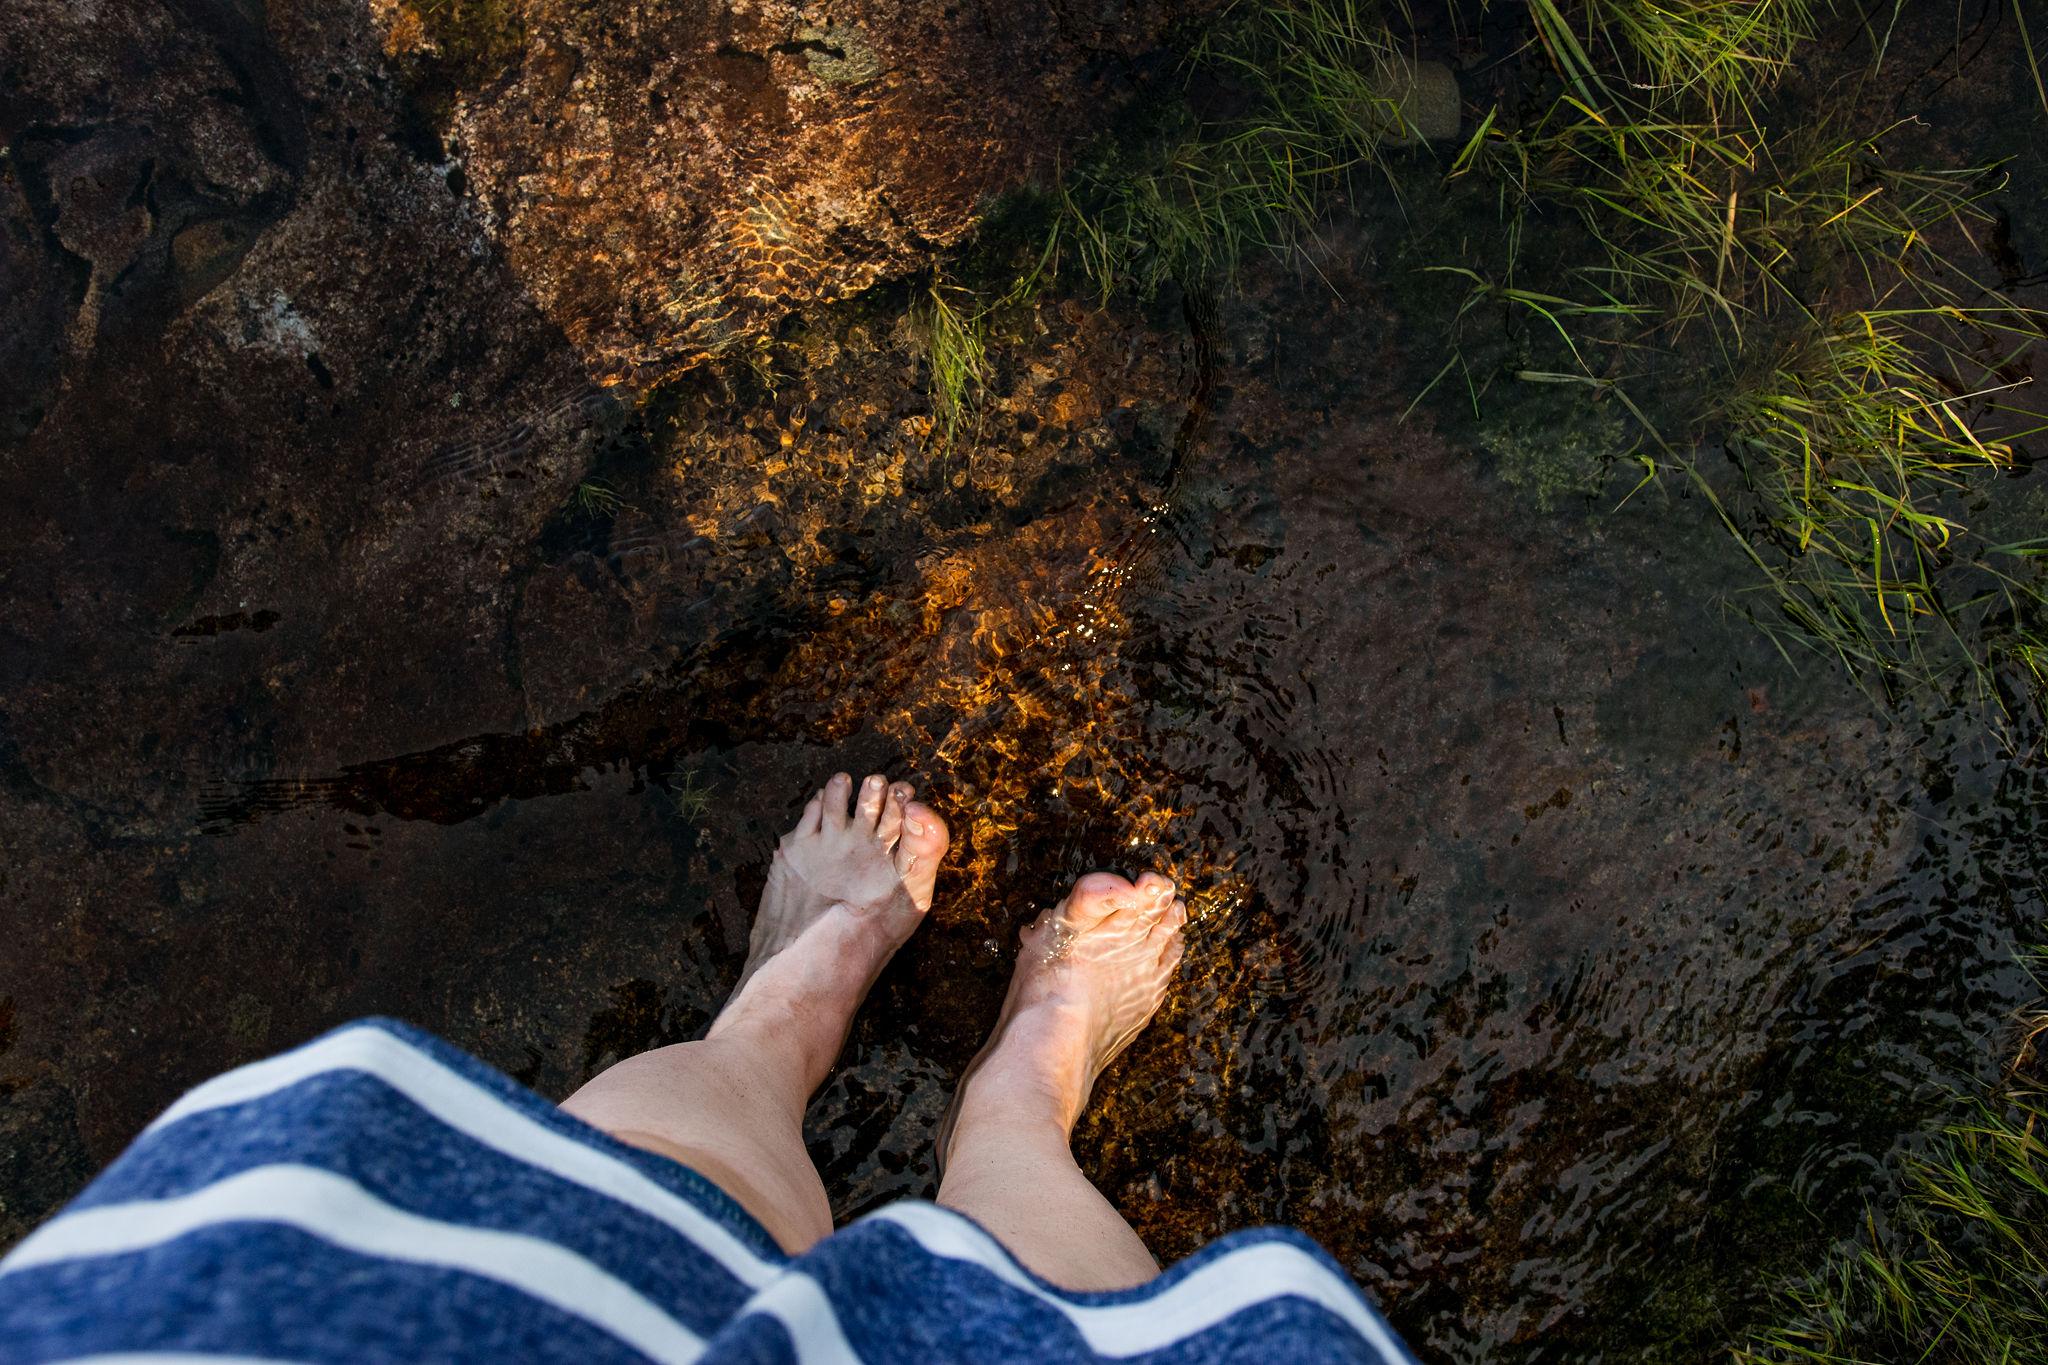 finnish woman relaxing barefoot on clear saimaa lake water